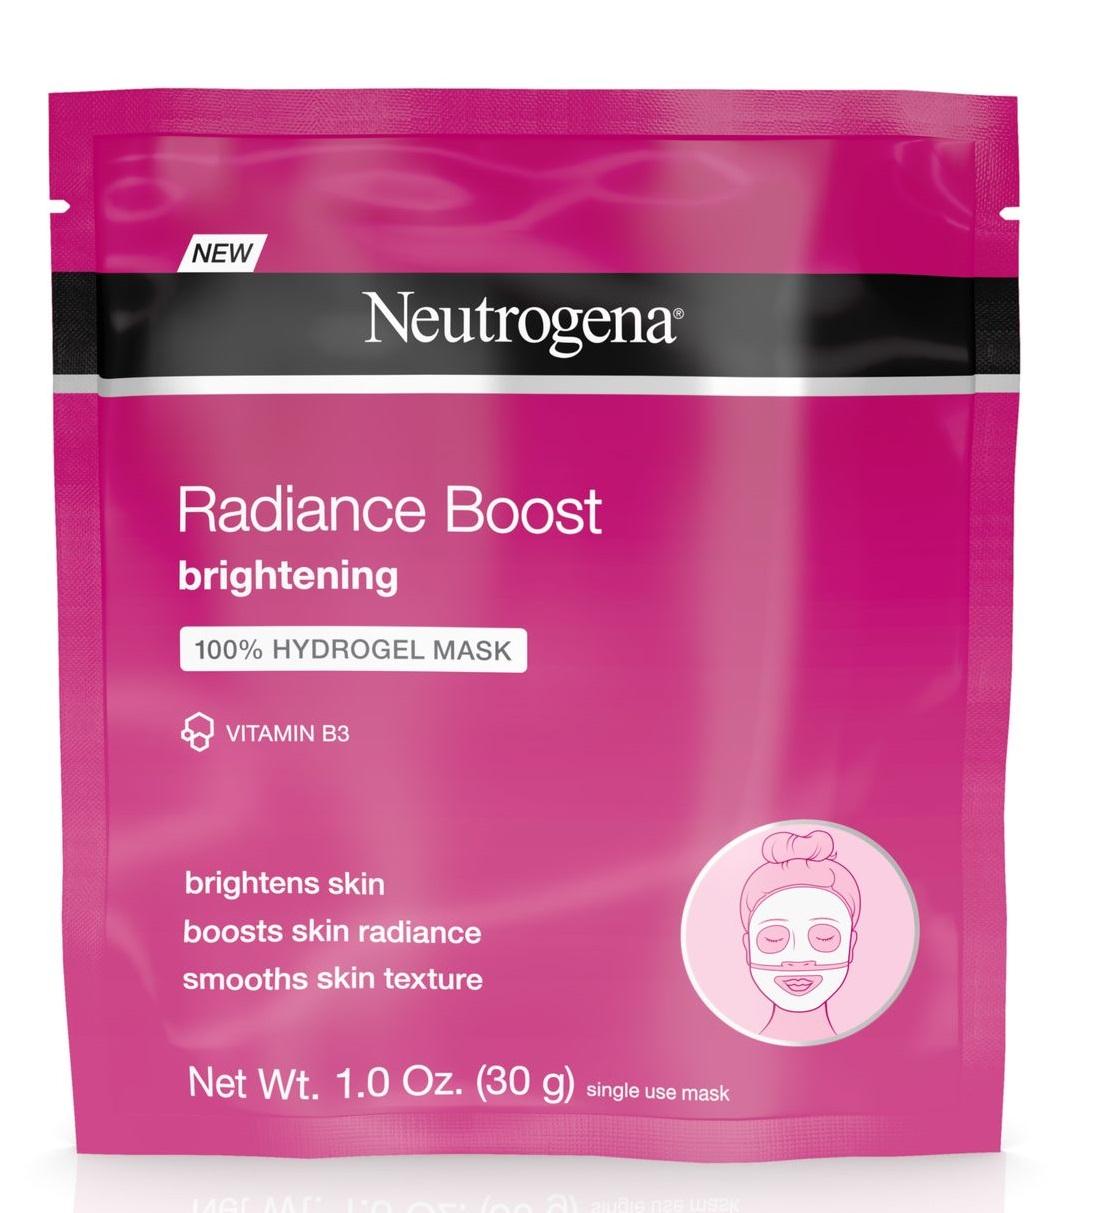 Neutrogena® Radiance Boost Brightening 100% Hydrogel Mask